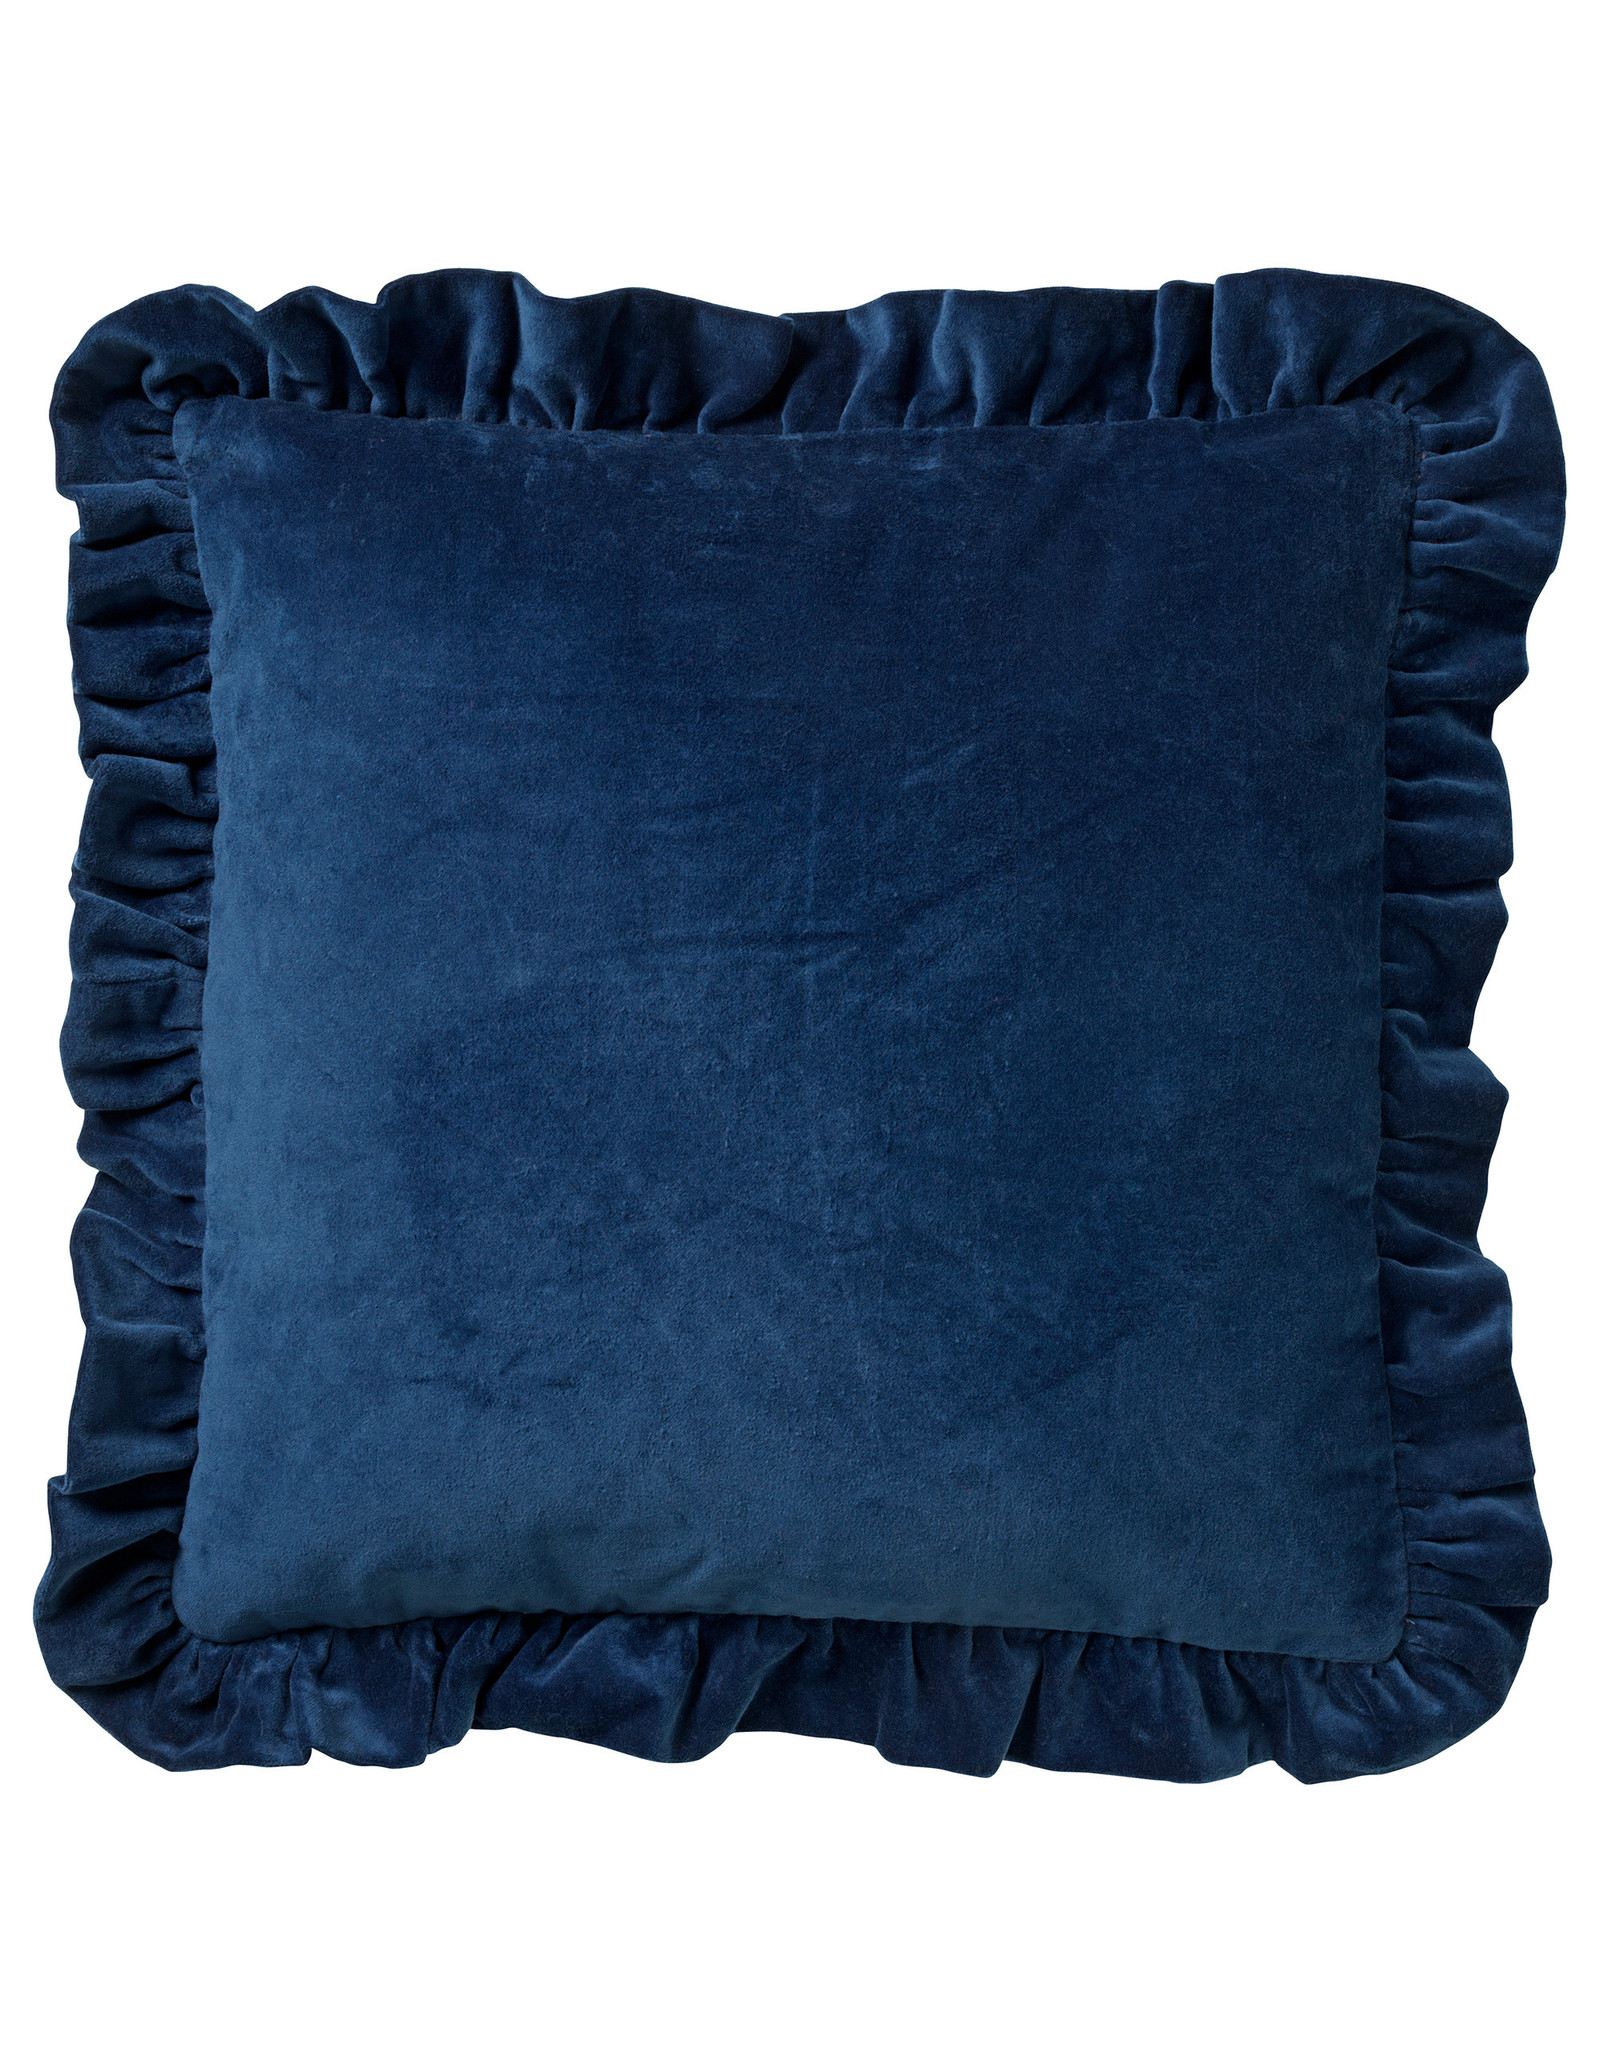 Dutch Decor Kussen - Yara Insignia Blue